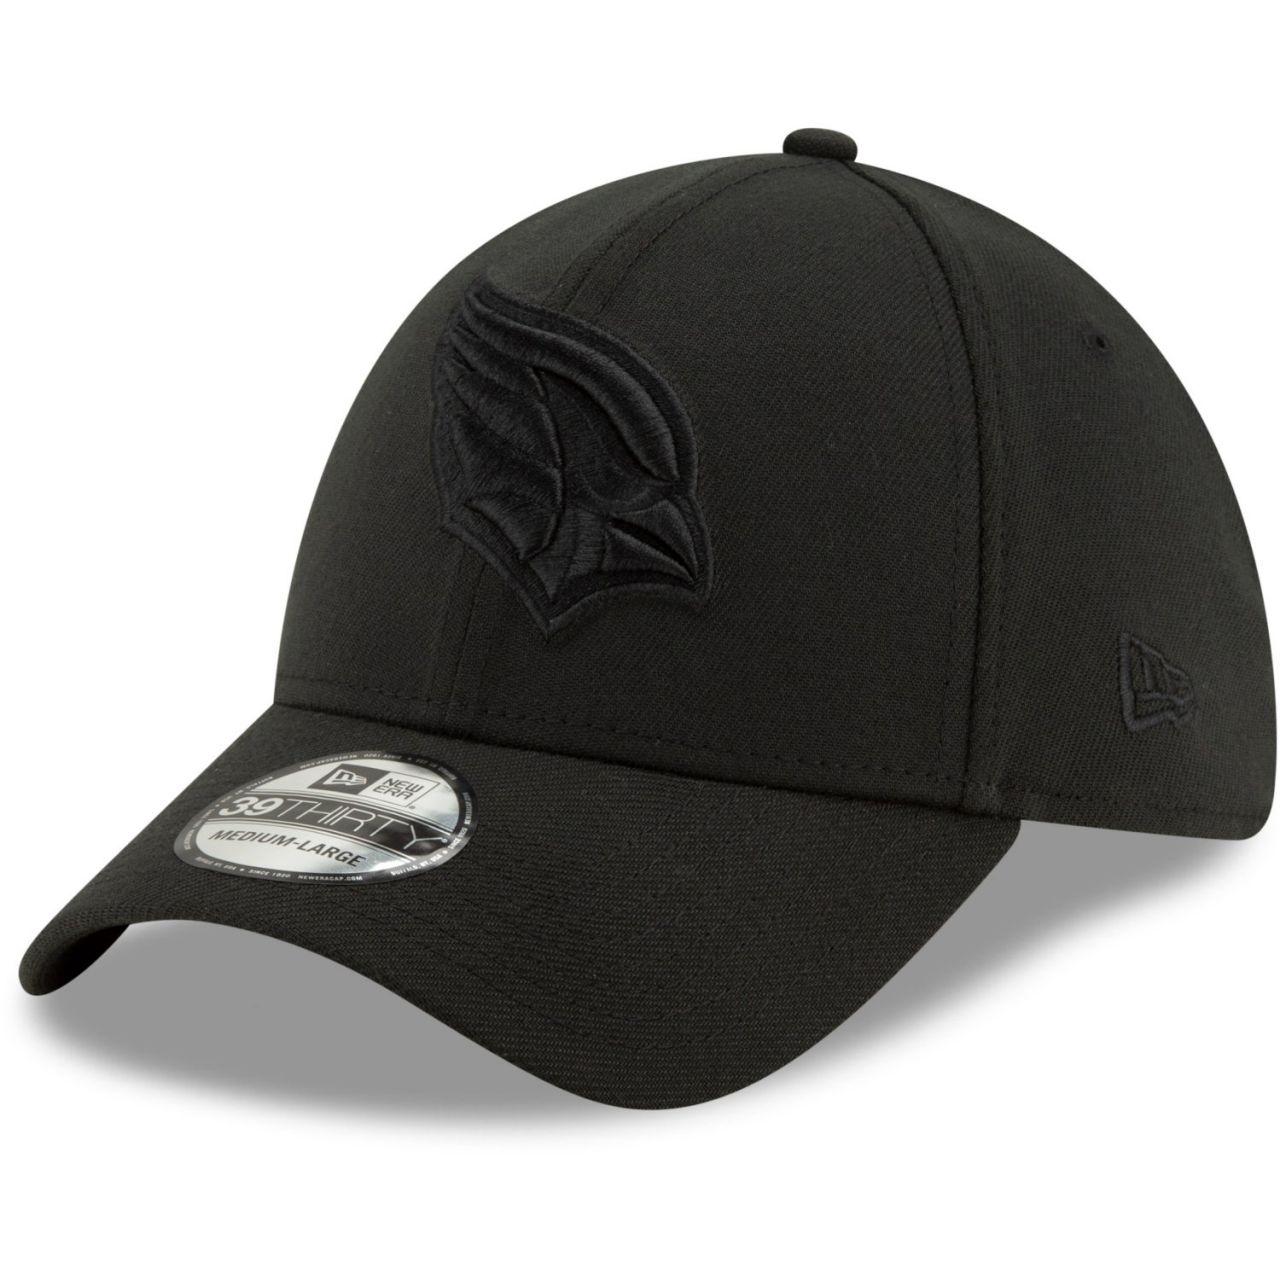 amfoo - New Era 39Thirty Stretch Cap - NFL Arizona Cardinals